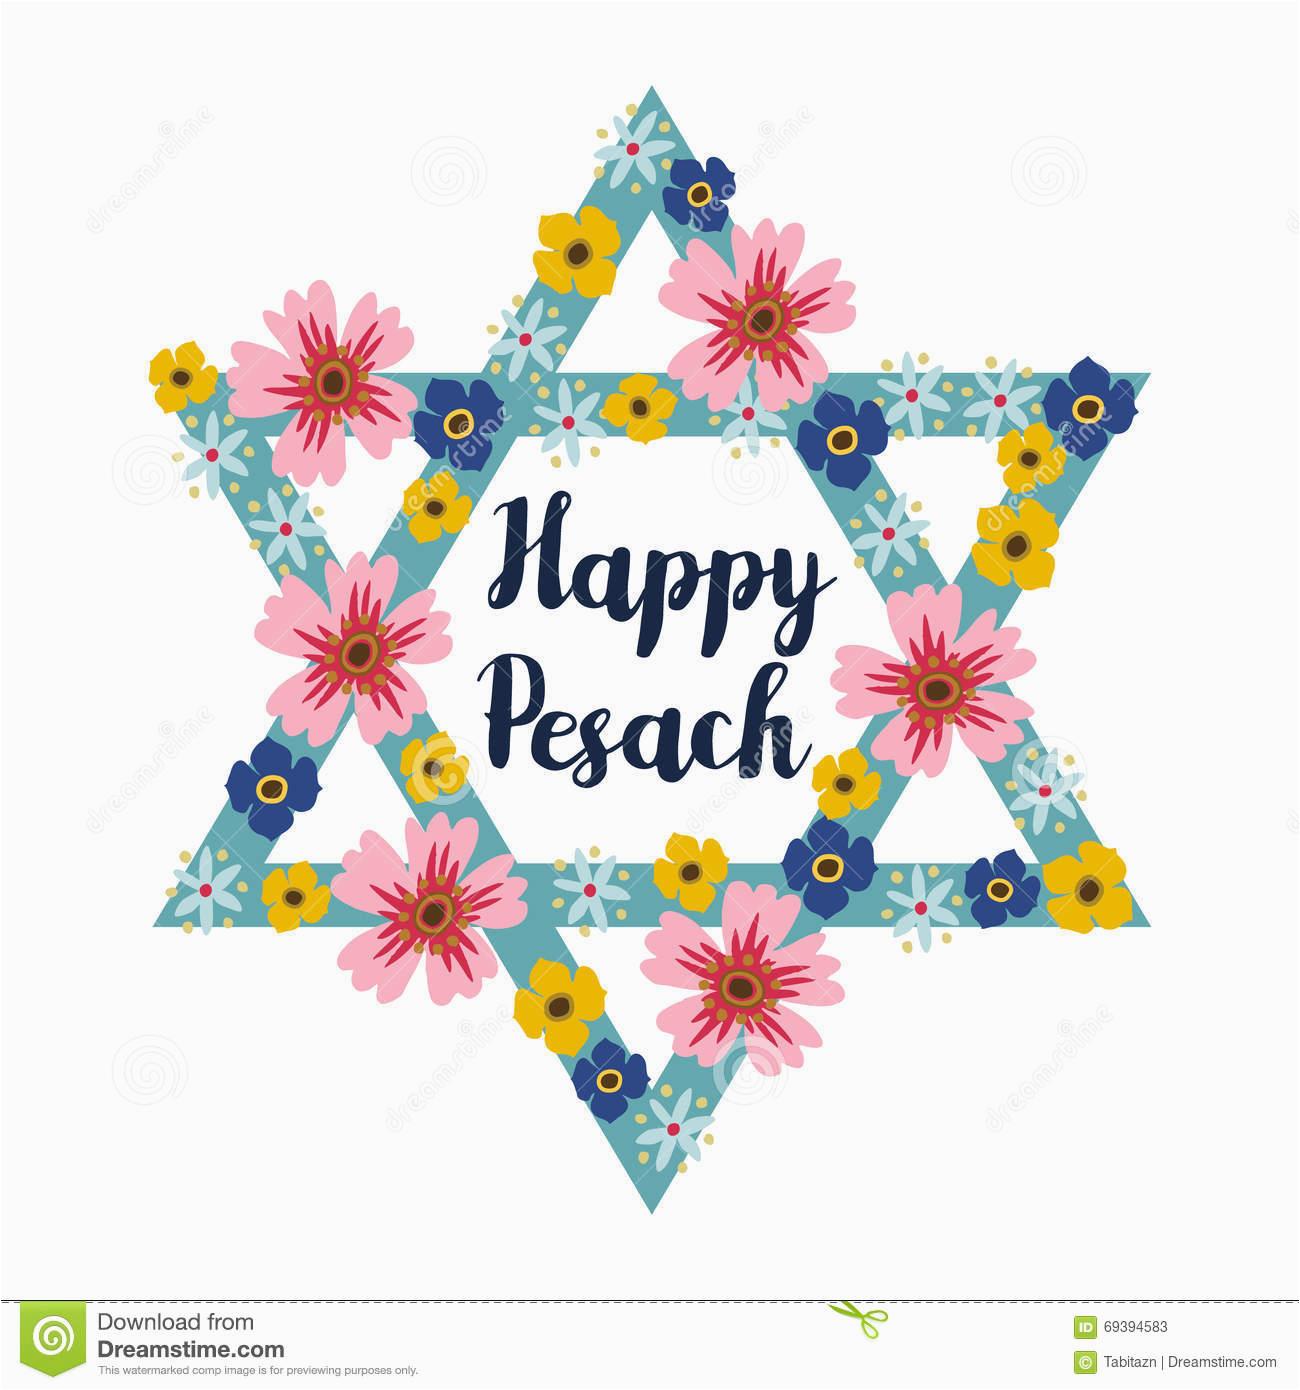 stock illustration pesach passover greeting card jewish star flowers illustration background hand drawn image69394583